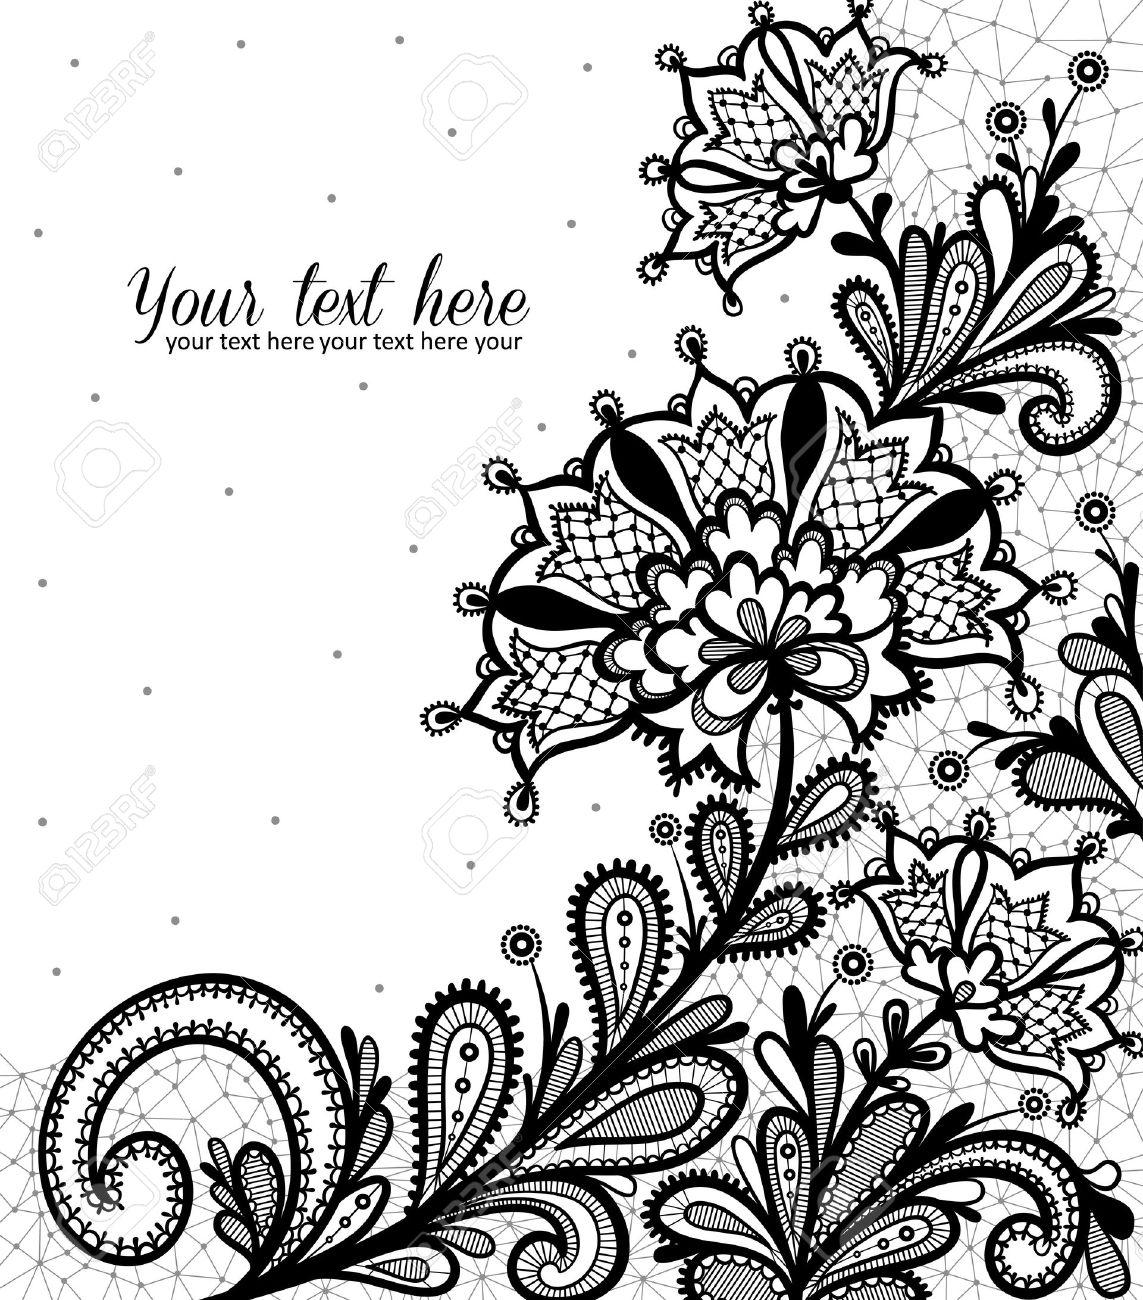 Black lace vector design. - 45531756